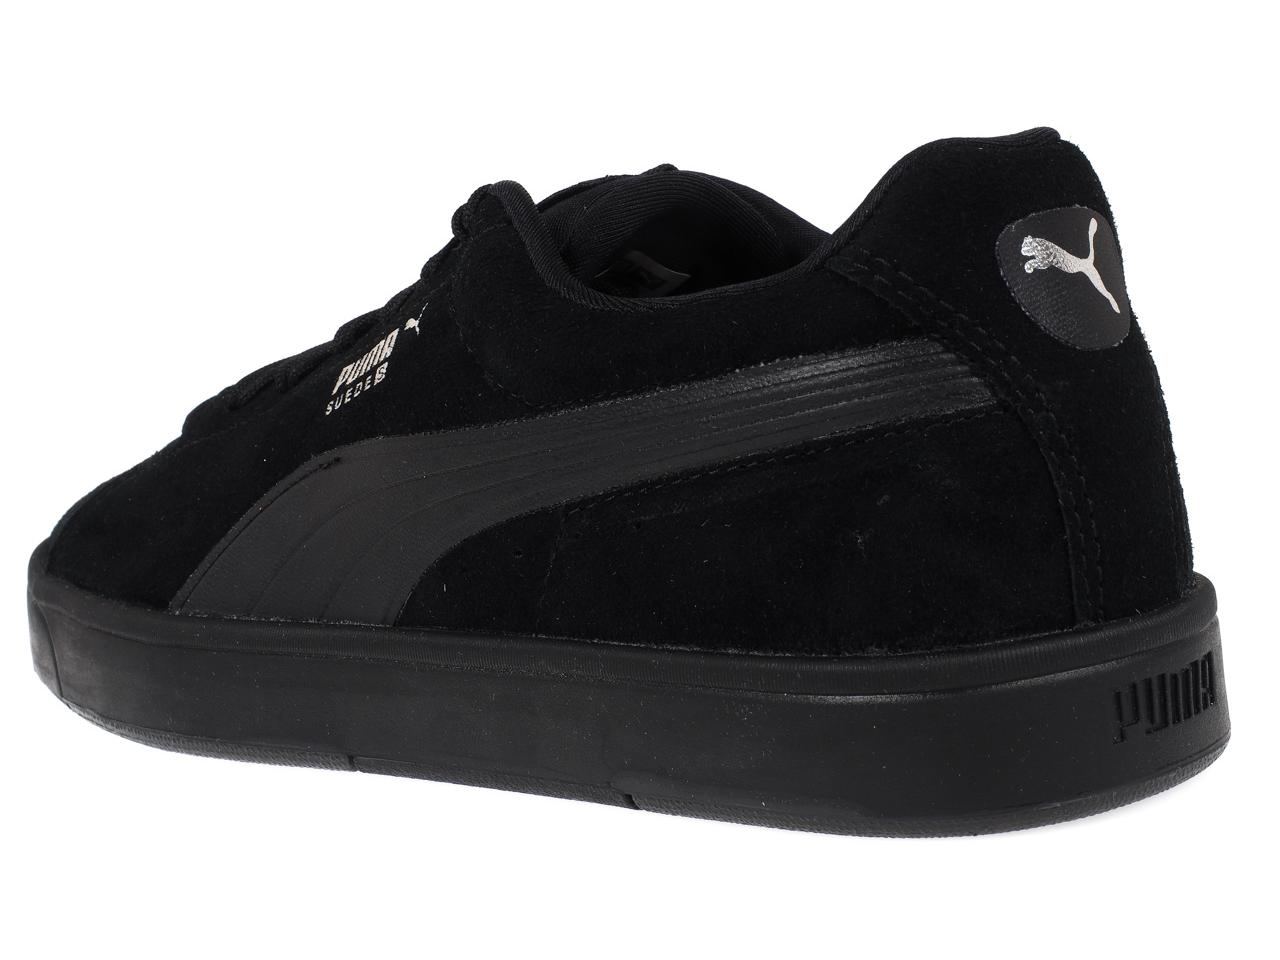 Chaussures basses cuir ou simili Puma Suede s noir/nr noir/nr noir/nr Noir 44428 - Neuf 5aeb30